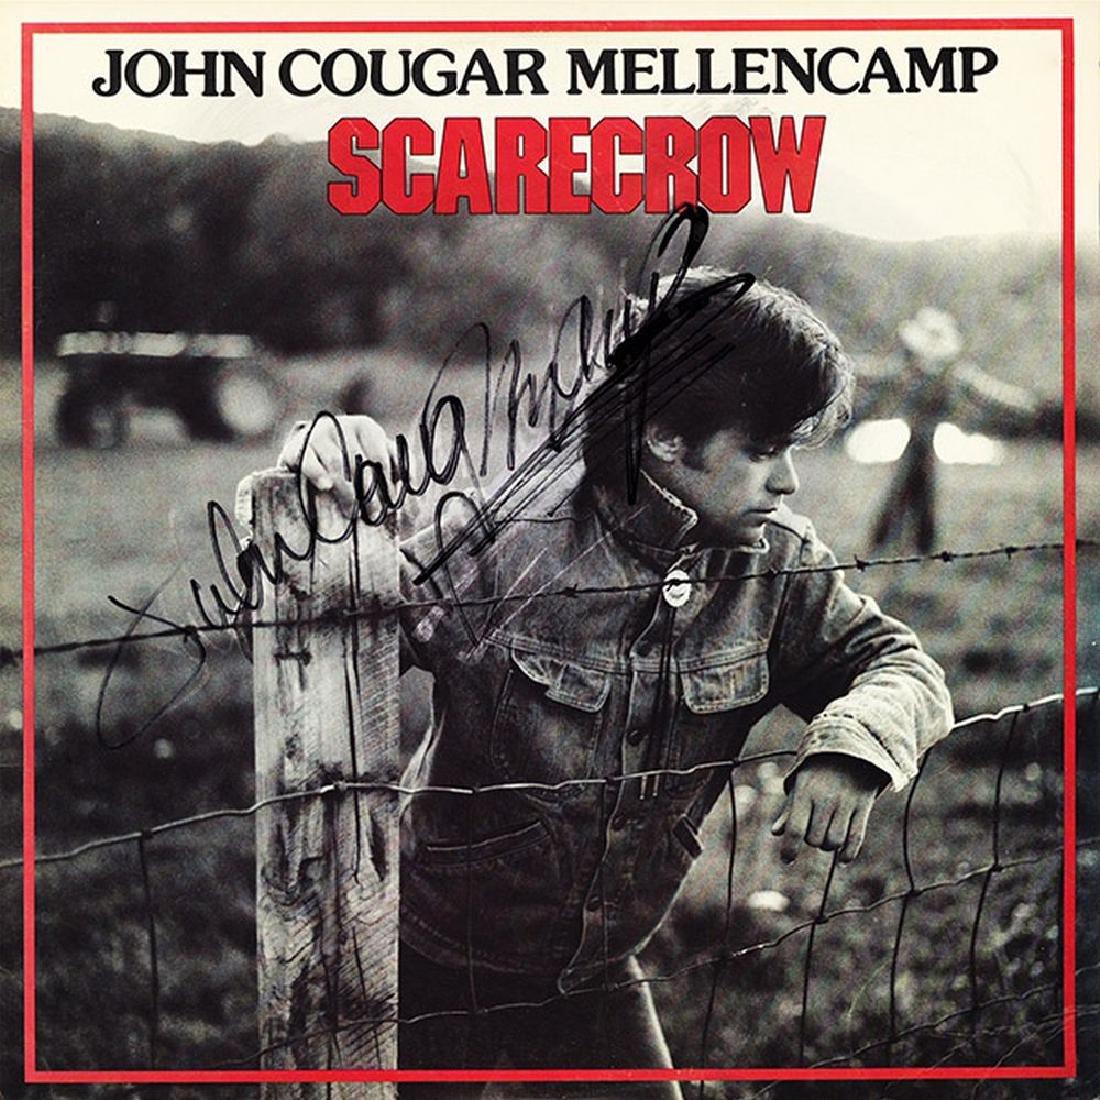 John Cougar Mellencamp Signed Scarecrow Album